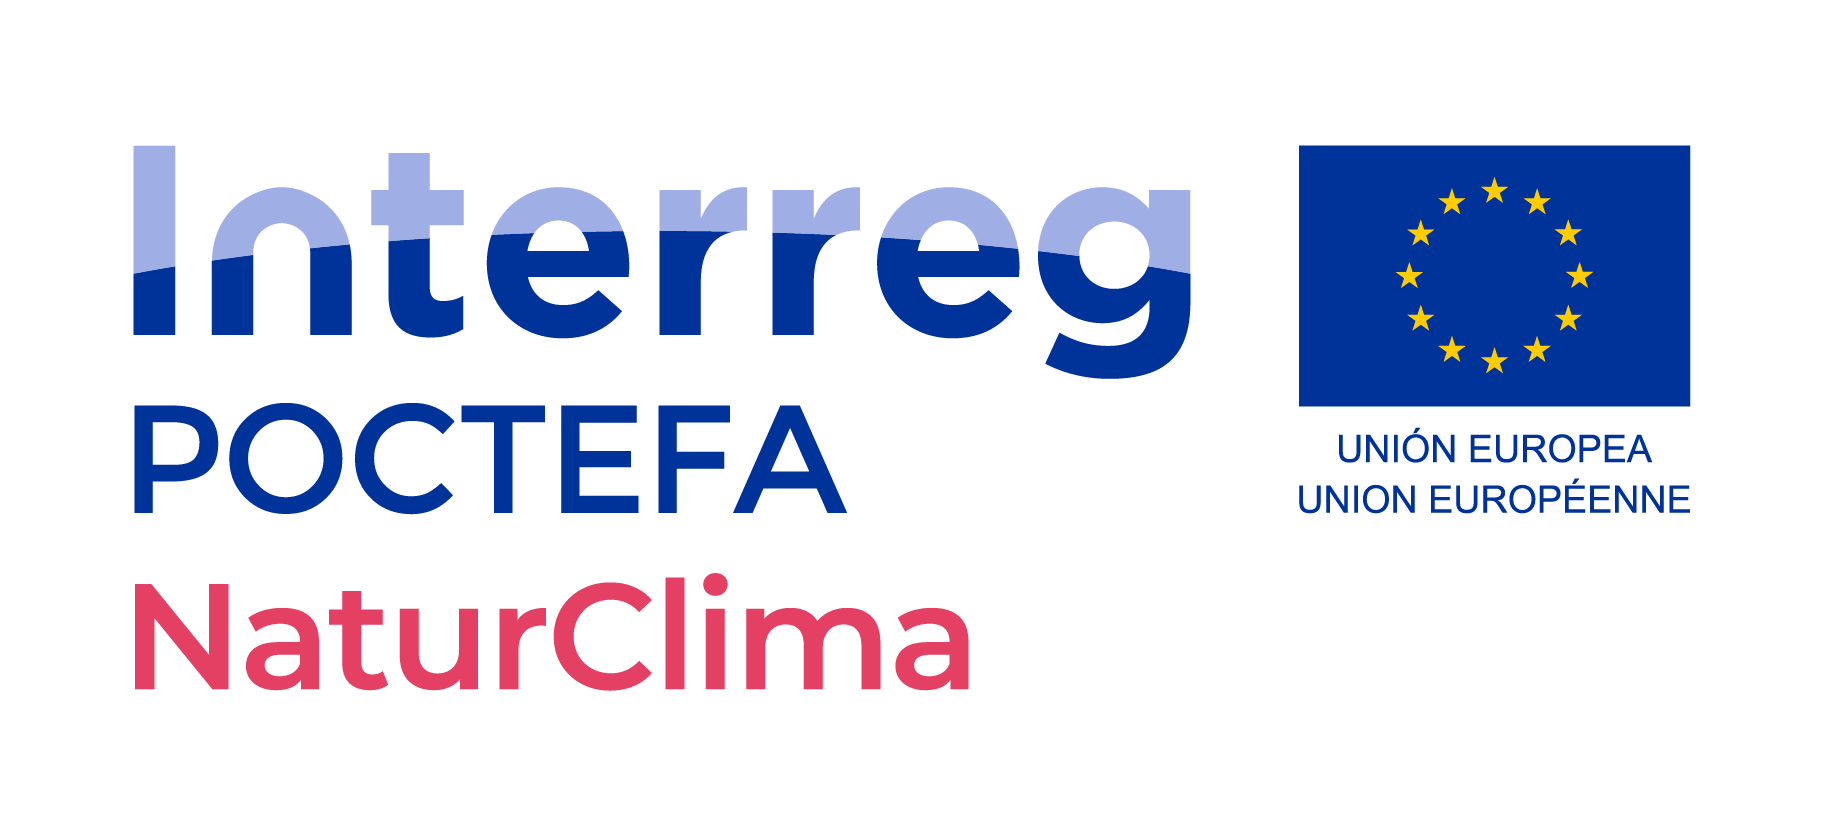 Logotipoa NaturClima